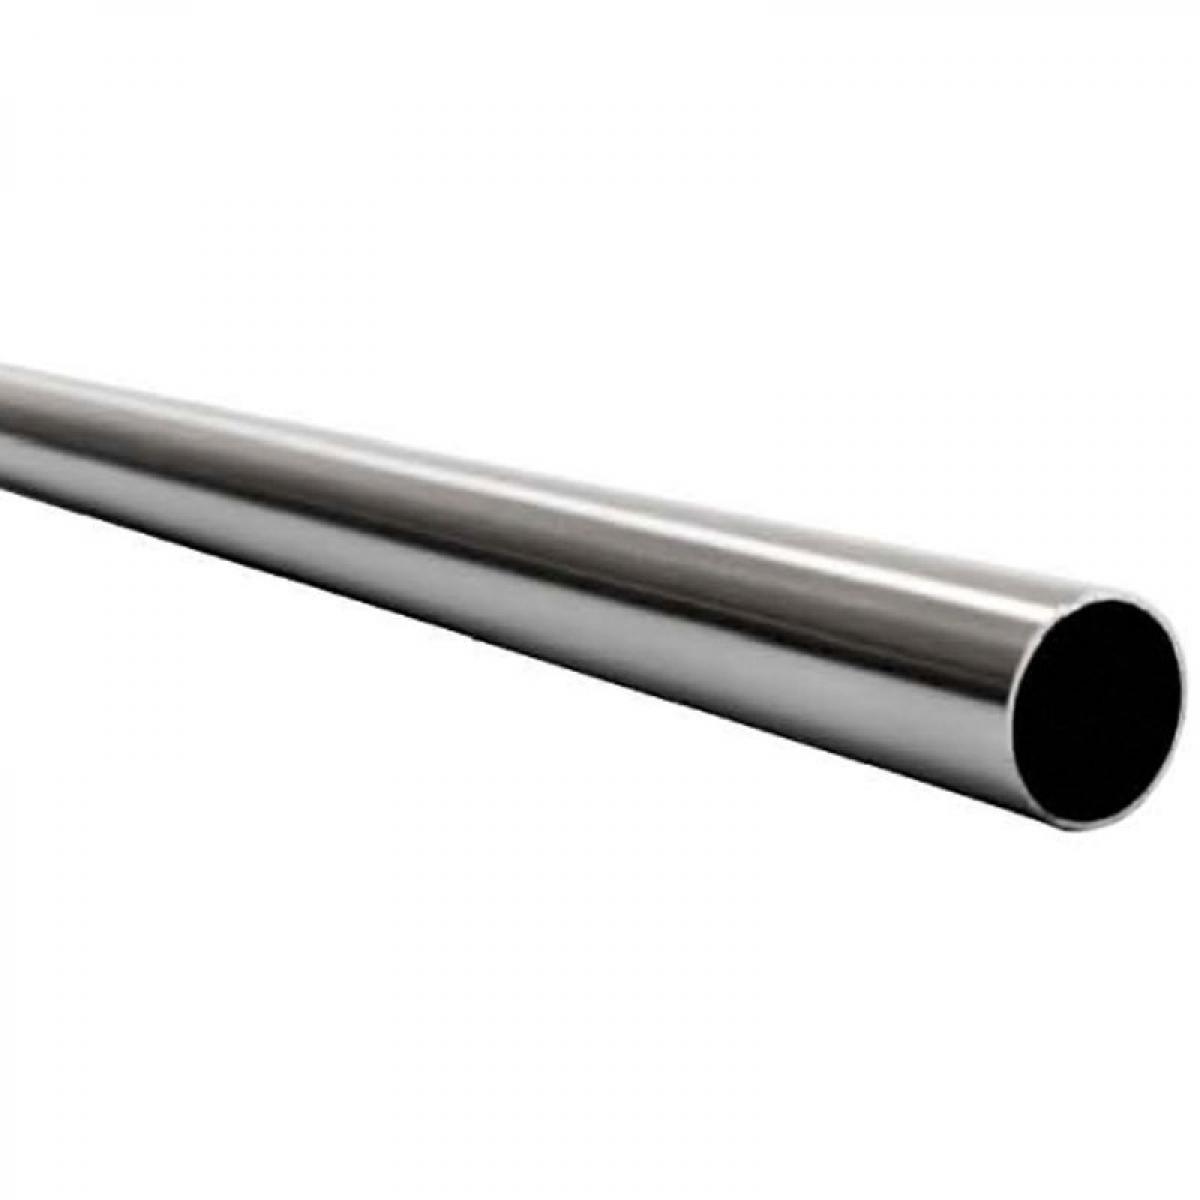 Adler Tube inox ?19 - Décor : Poli - Matériau : Inox - Longueur : 1600 mm - Diamètre : 19 mm - ADLER